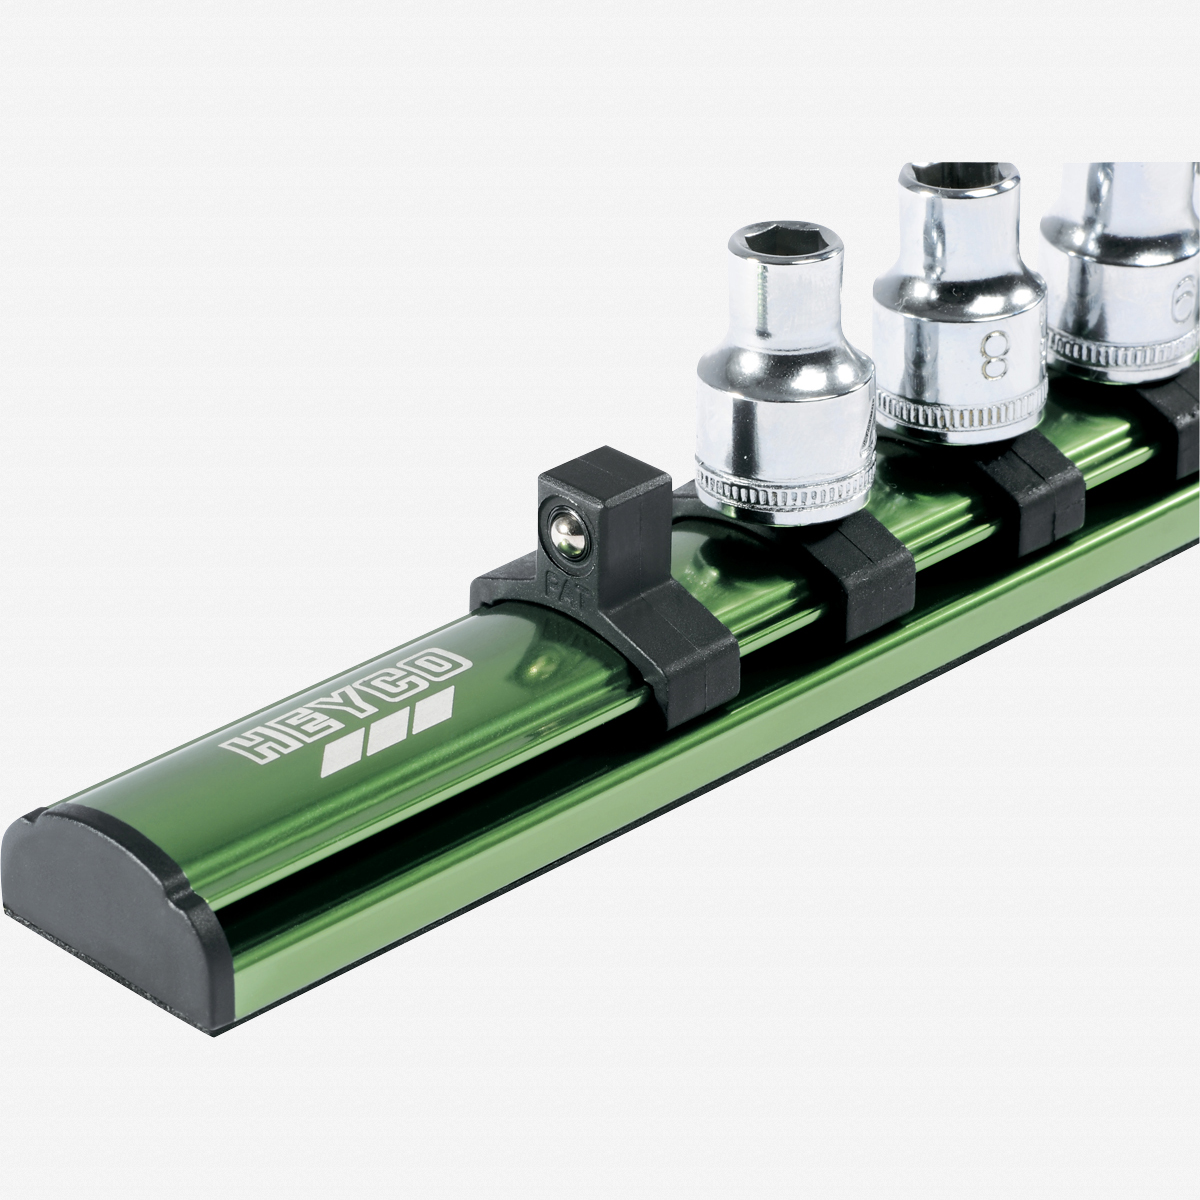 "Heyco 7102516 Magnetic Aluminum Socket Rail - Empty, 1/4"" Drive - KC Tool"